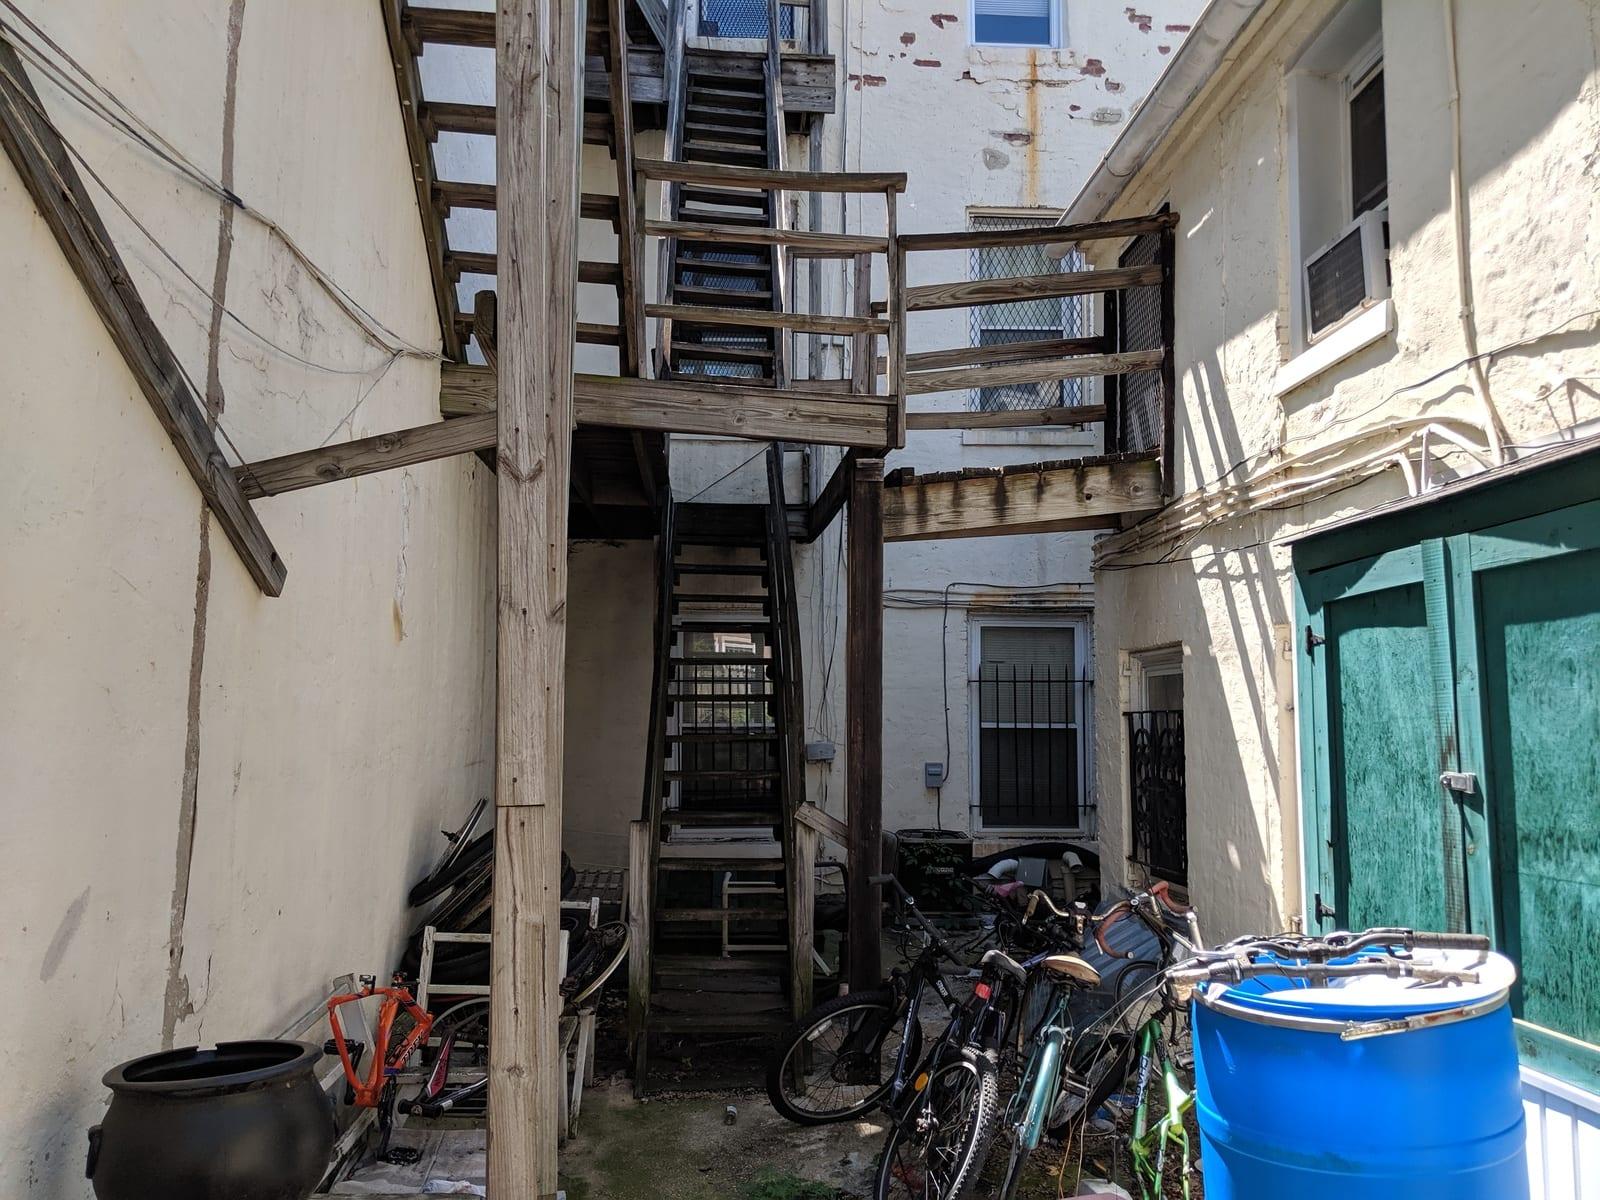 89 615 Paca rear courtyard